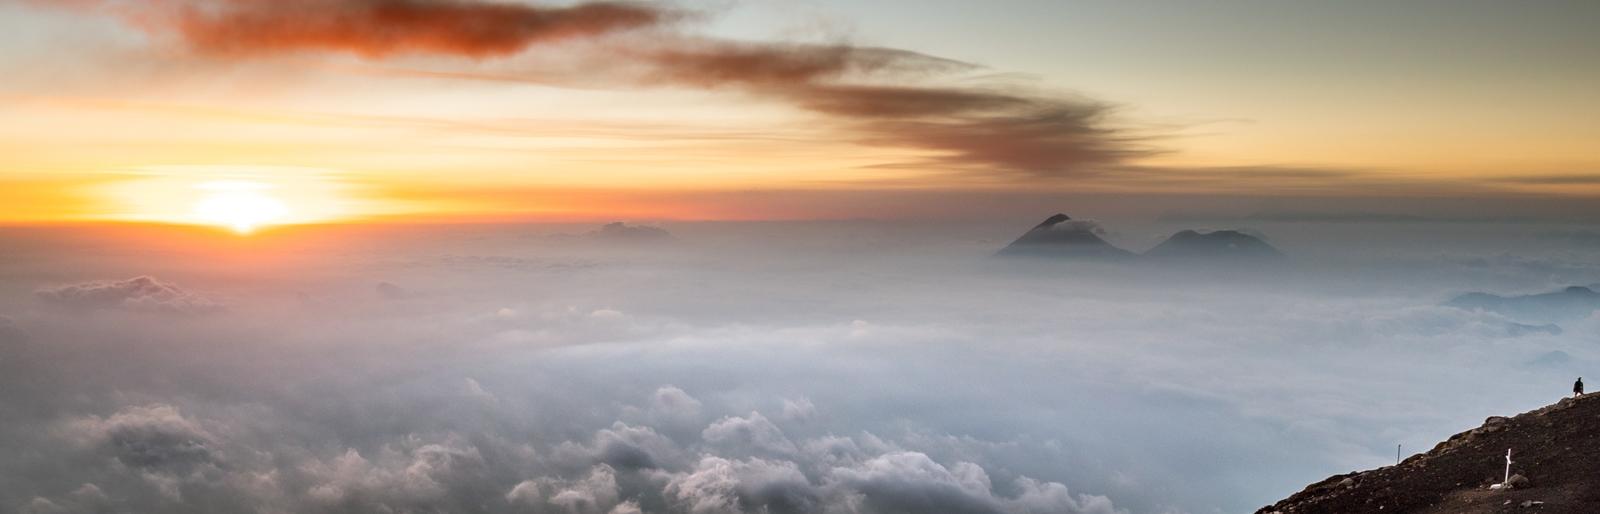 View from volcano Acatenango, Guatemala